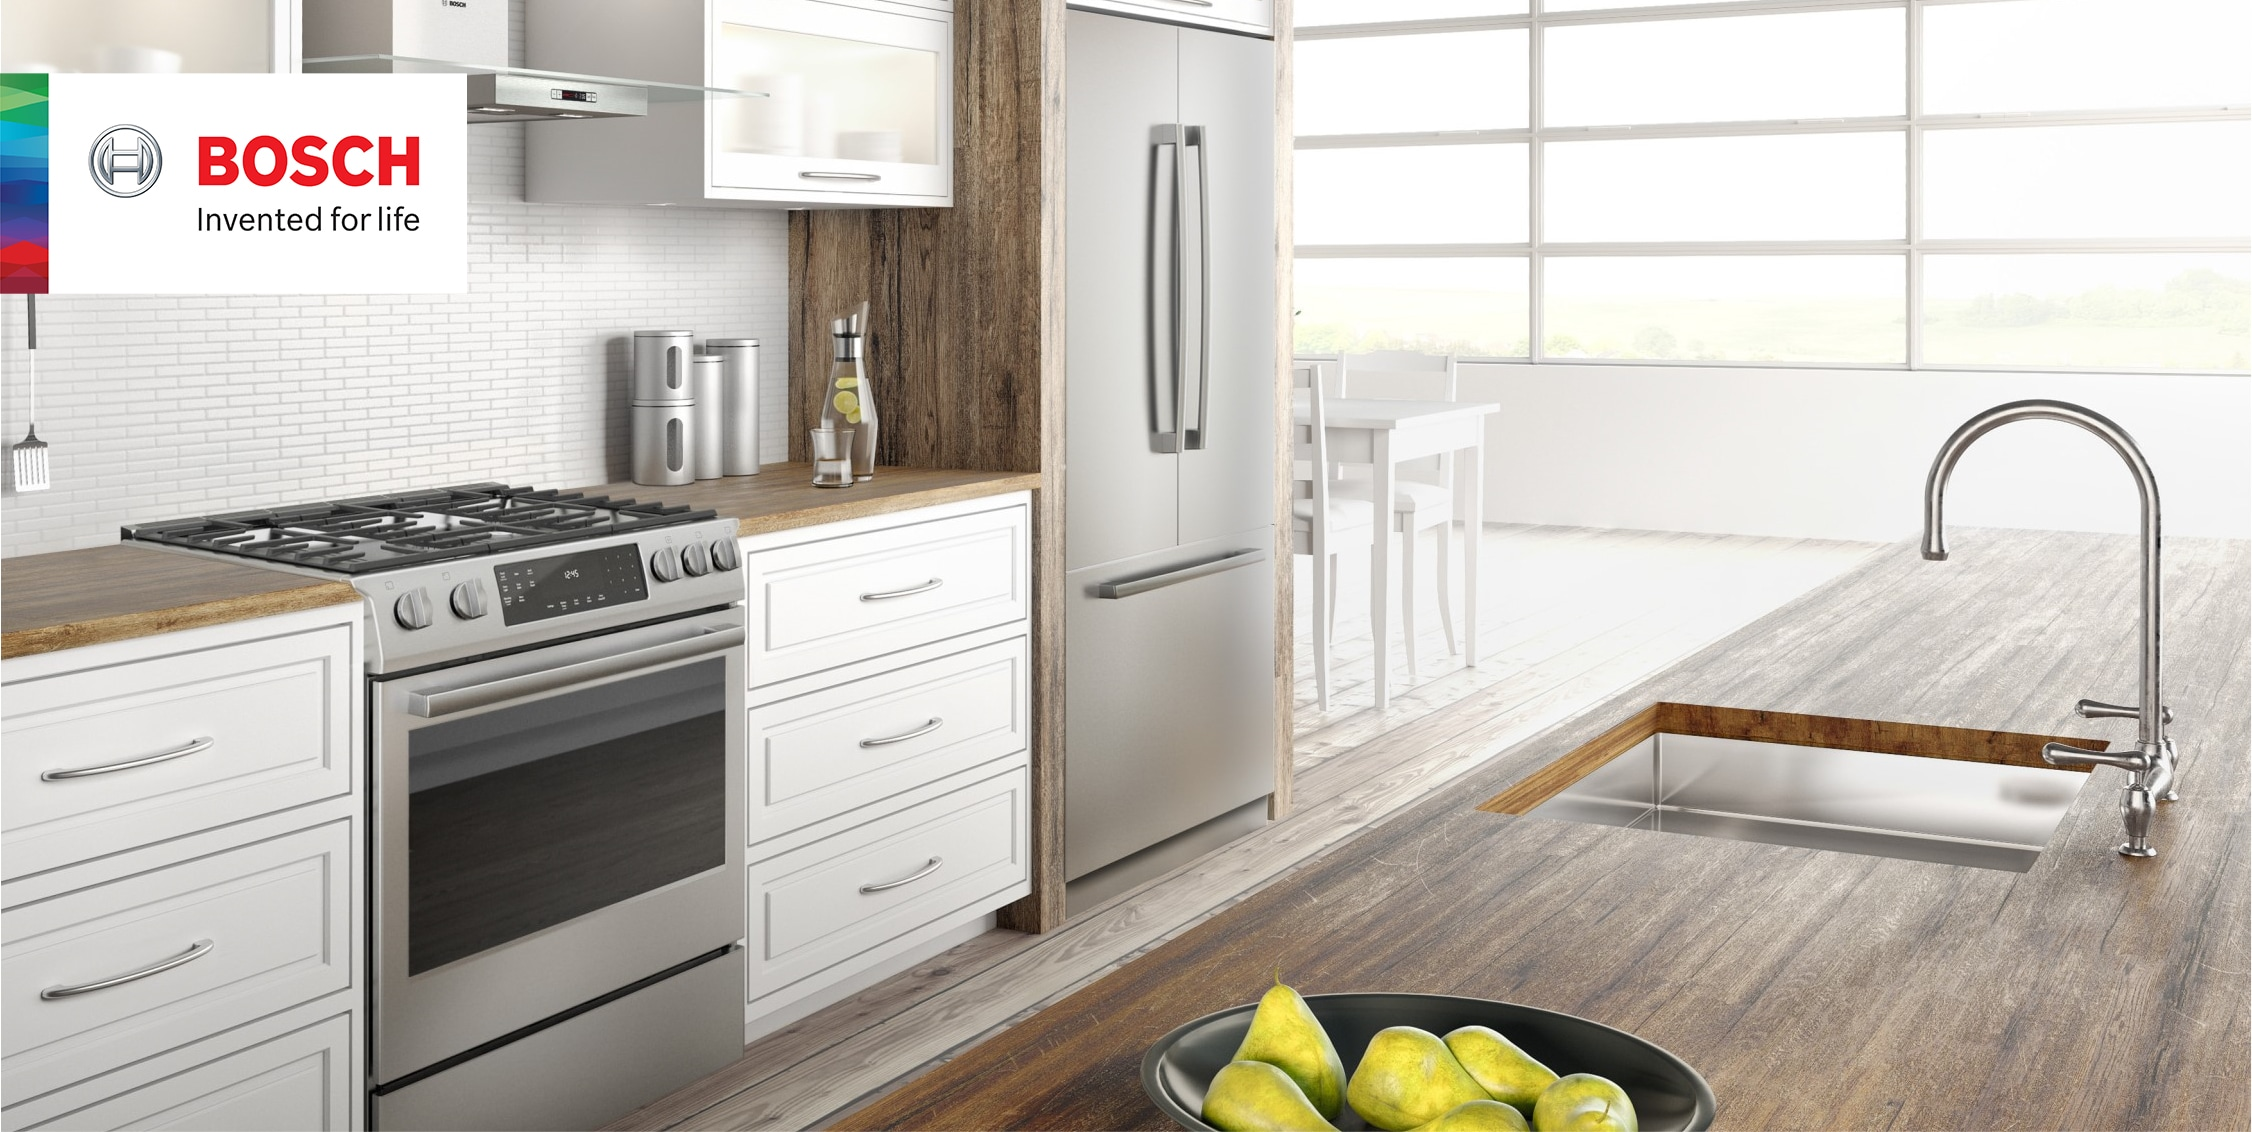 Bosch - Save 15 Percent | Zeglin\'s Home TV & Appliance Inc